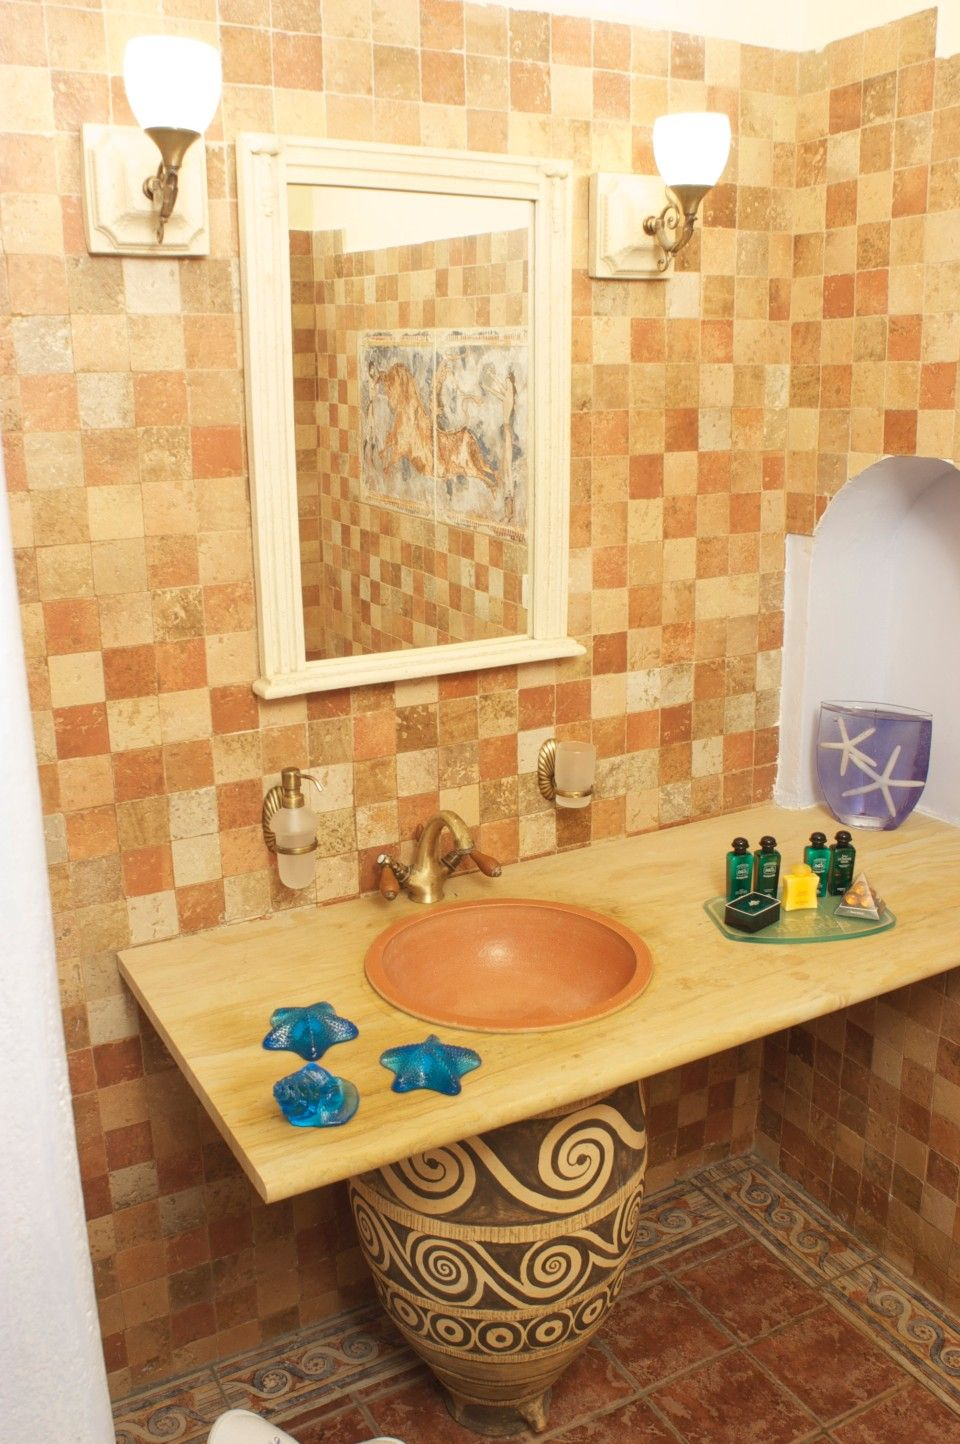 Astarte Suites Luxury Hotel | Luxury Bathroom & amenities